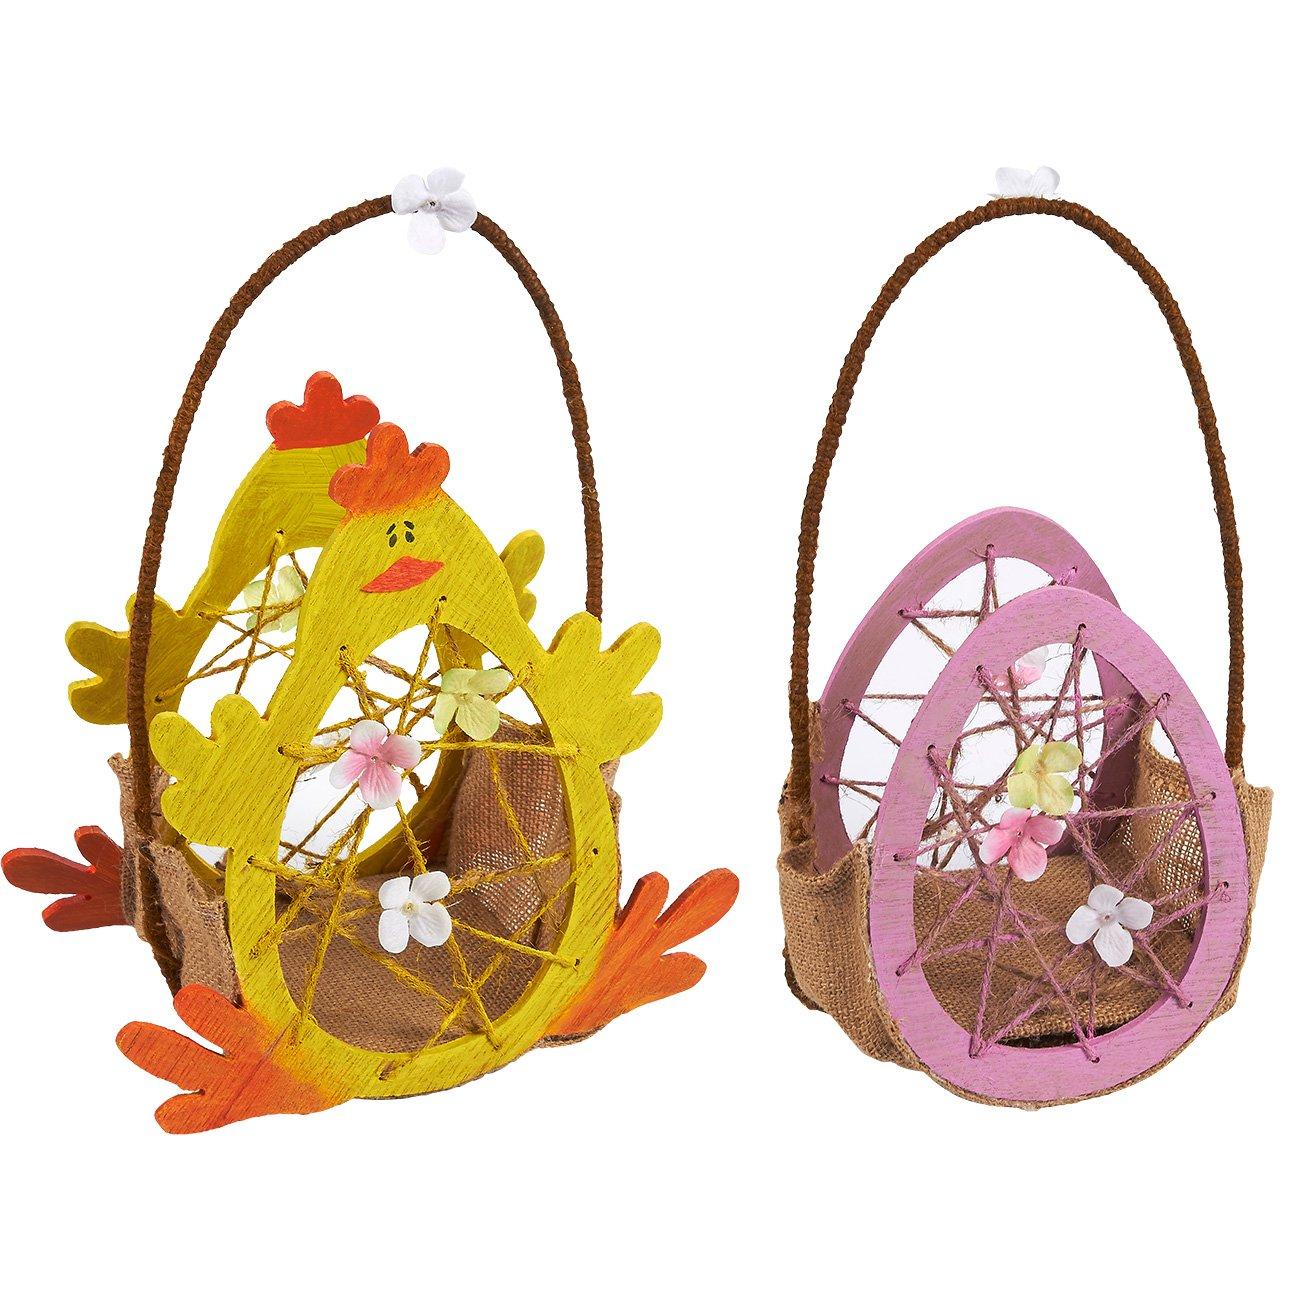 2 cute vintage easter egg baskets chicken eggs gifts holiday basket 2 cute vintage easter egg baskets chicken eggs gifts holiday basket kids jute negle Images